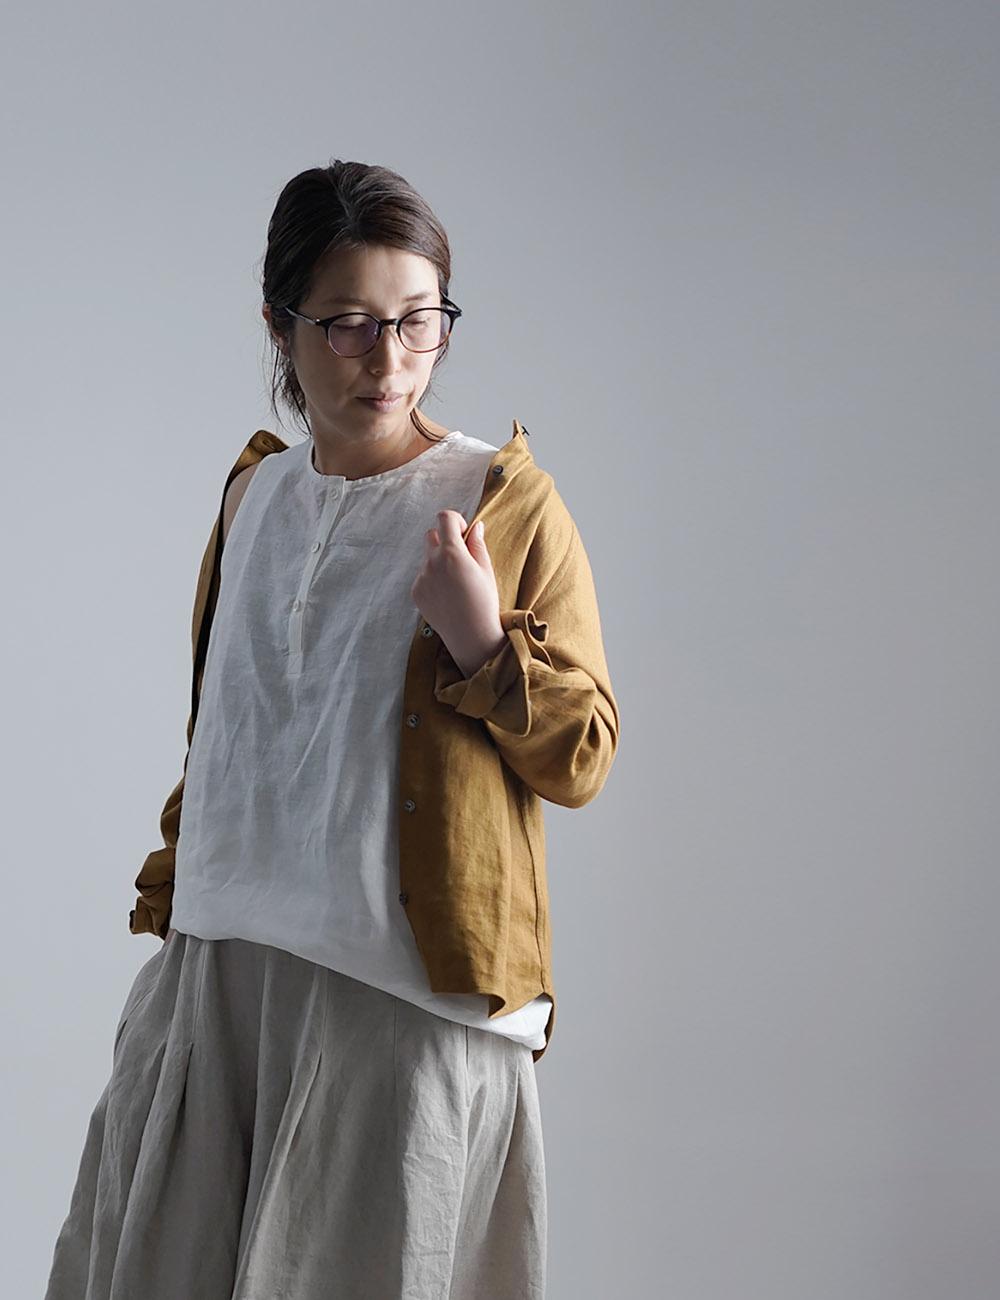 【wafu】雅亜麻 Linen Top ヘンリーネック ロング丈 インナーとしても /白色 p011a-wht1